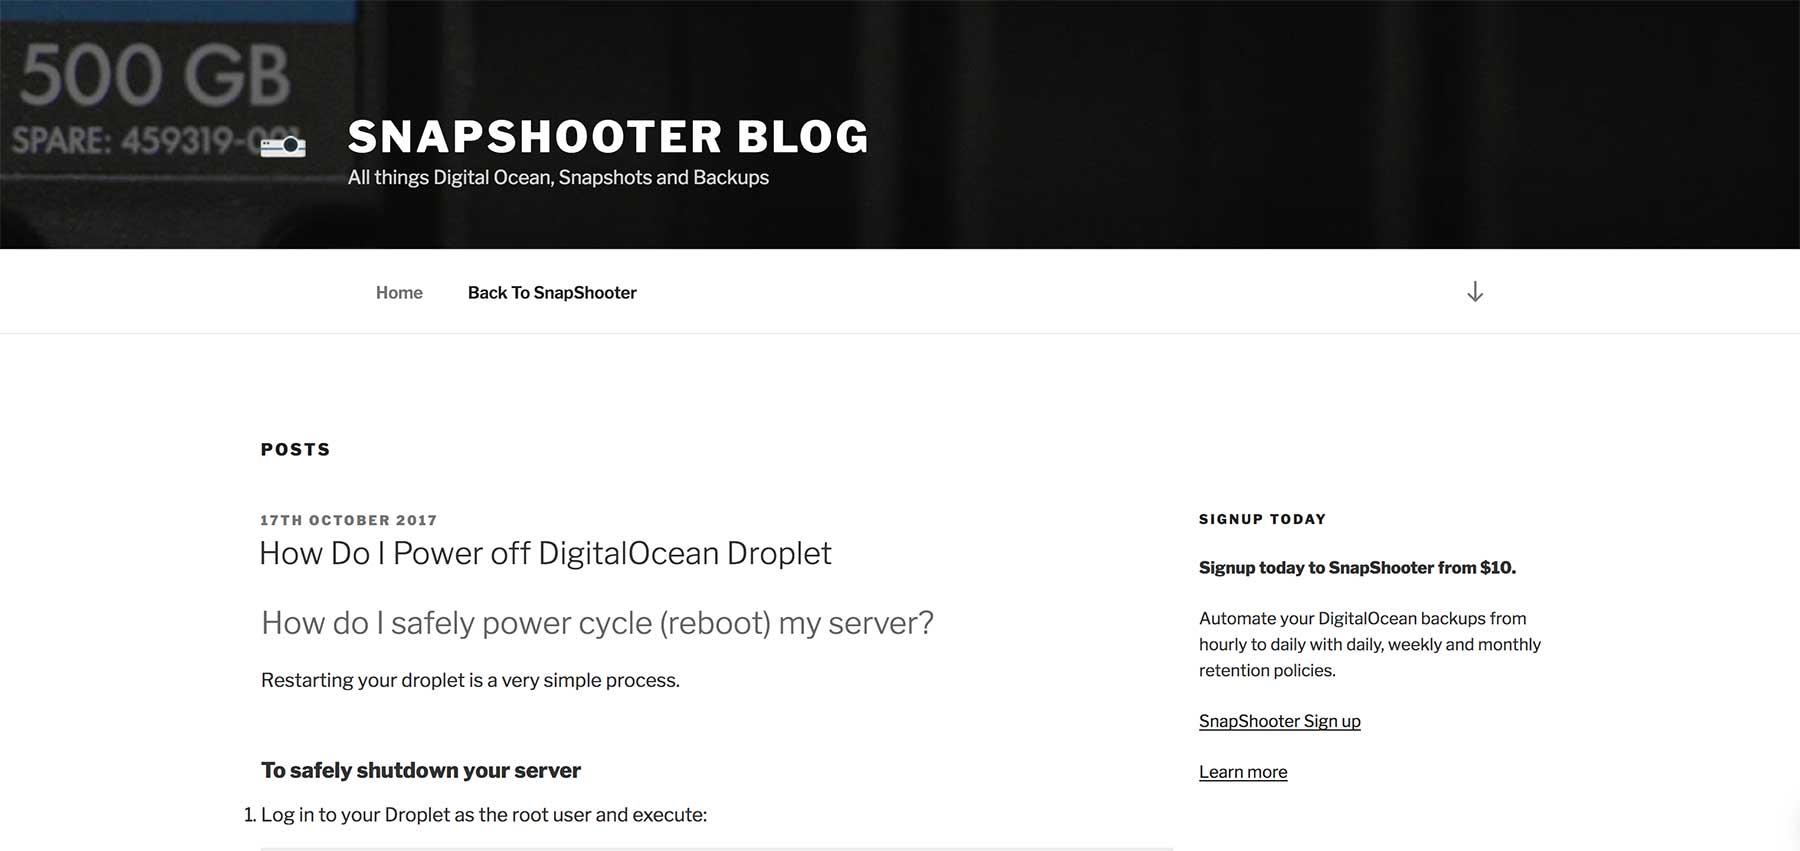 SnapShooter Blog